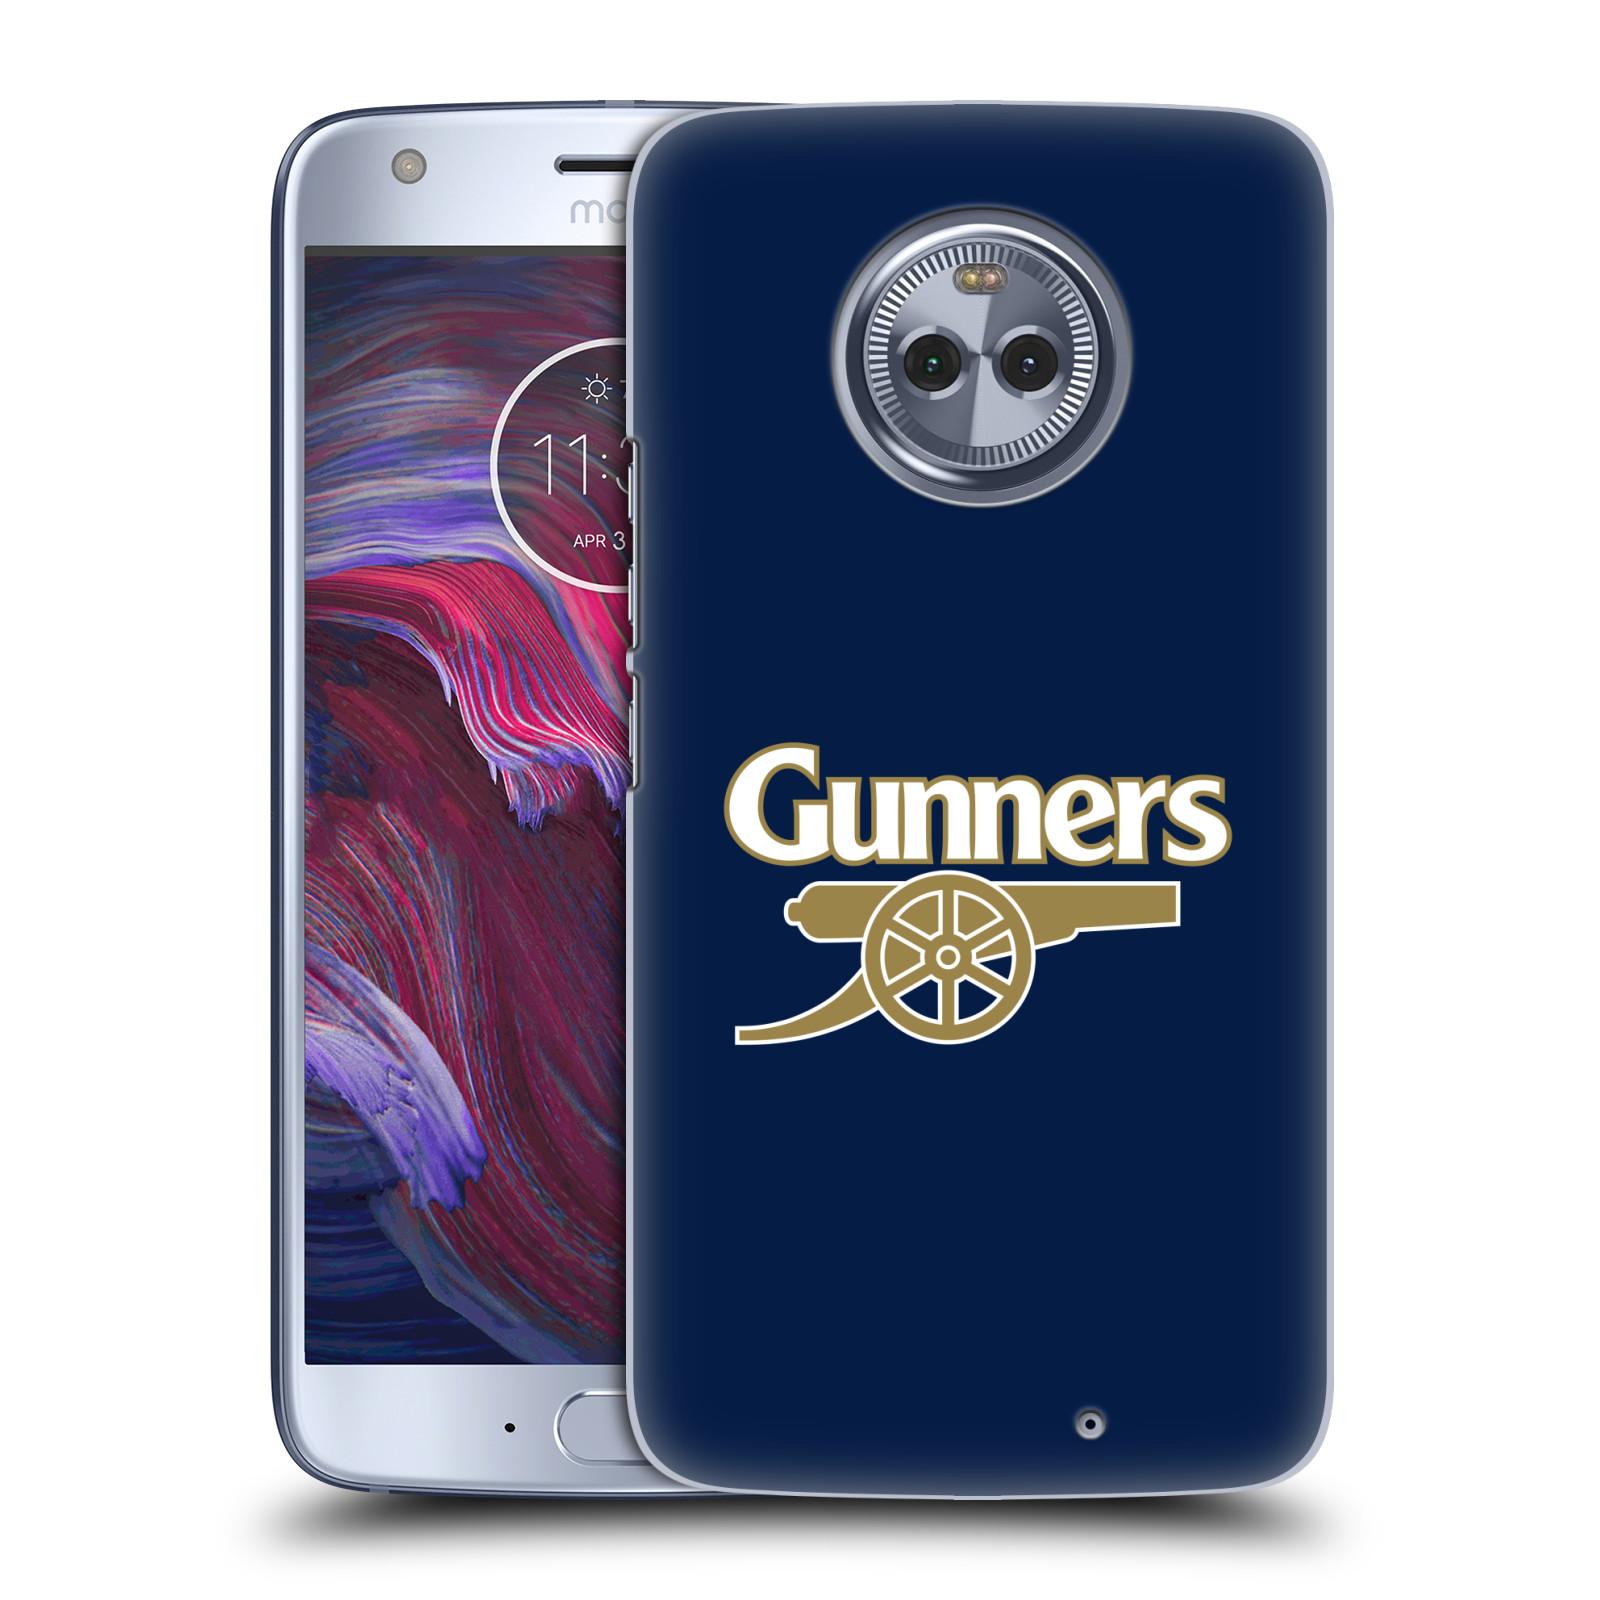 Plastové pouzdro na mobil Lenovo Moto X4 - Head Case - Arsenal FC - Gunners